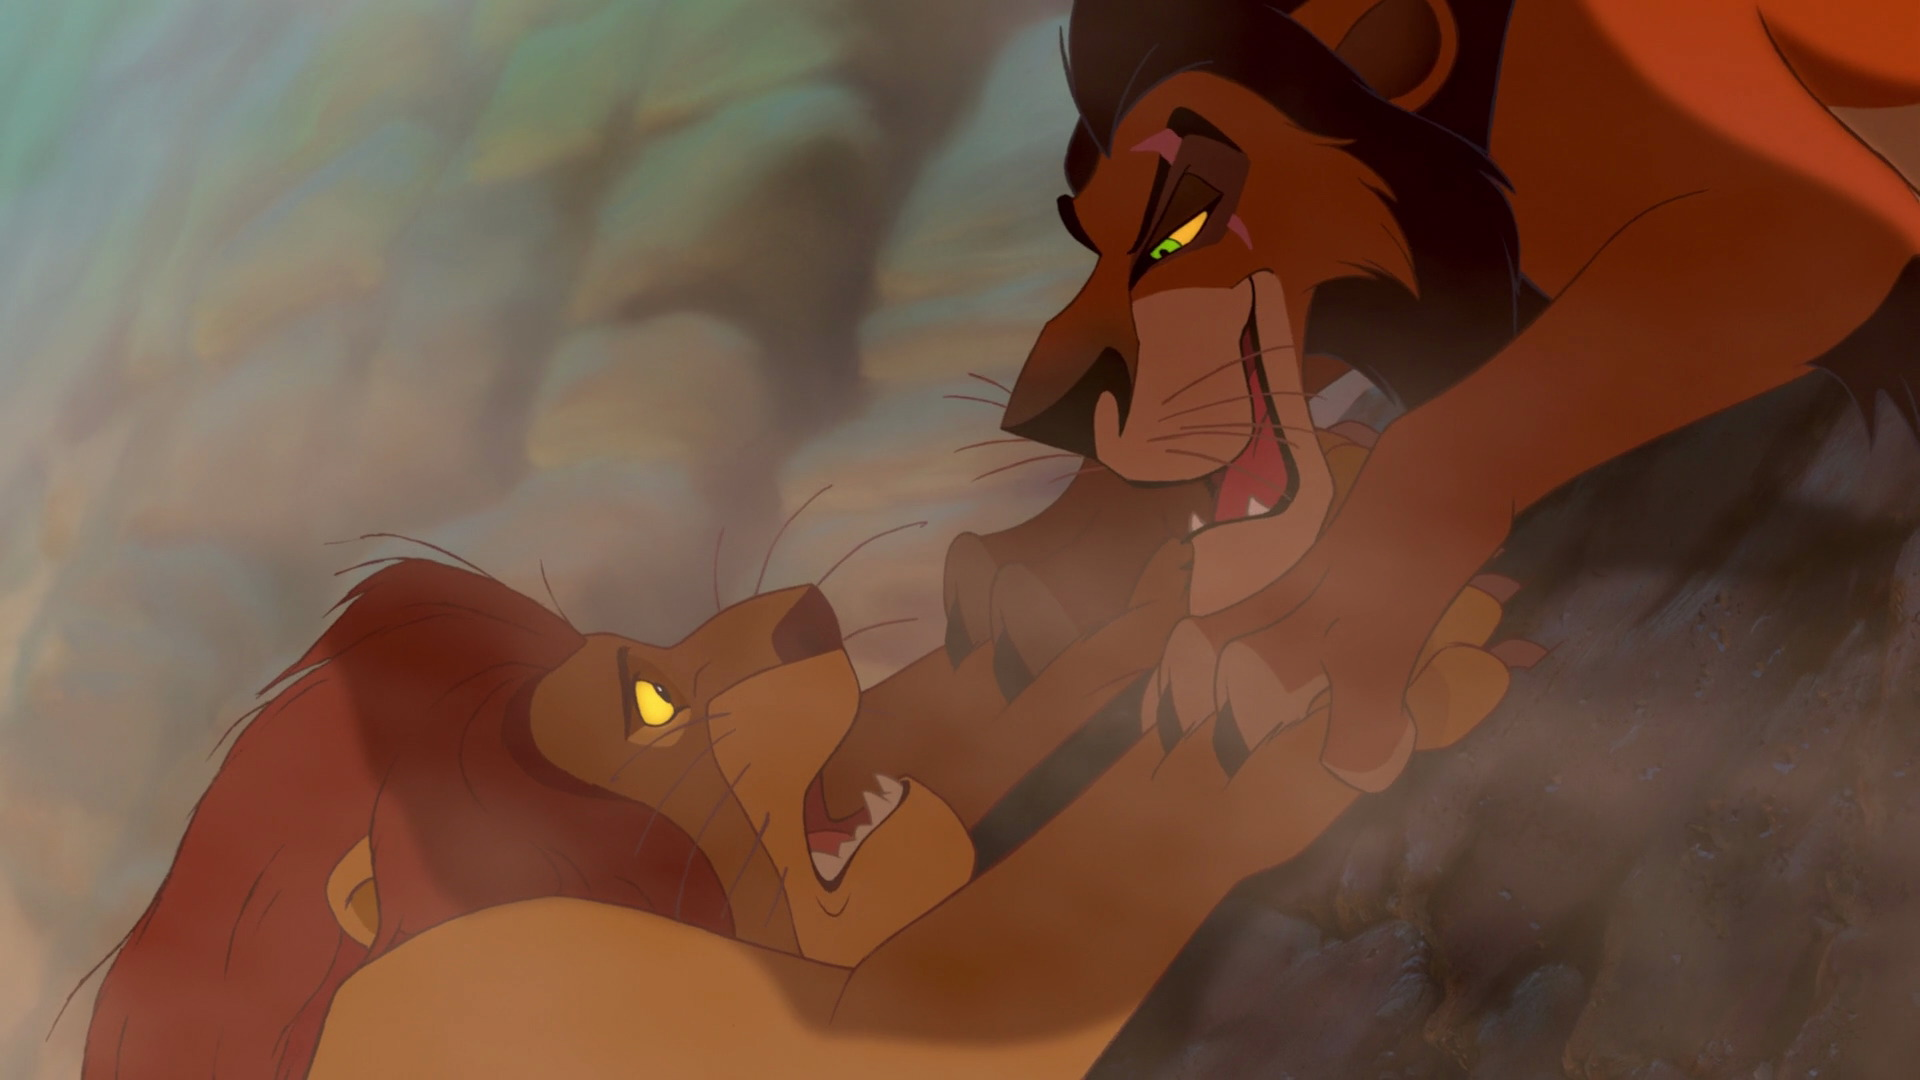 [Salvateur] Soyez prêtes ! Mufasa-vs-Scar-the-lion-king-2801551-640-380